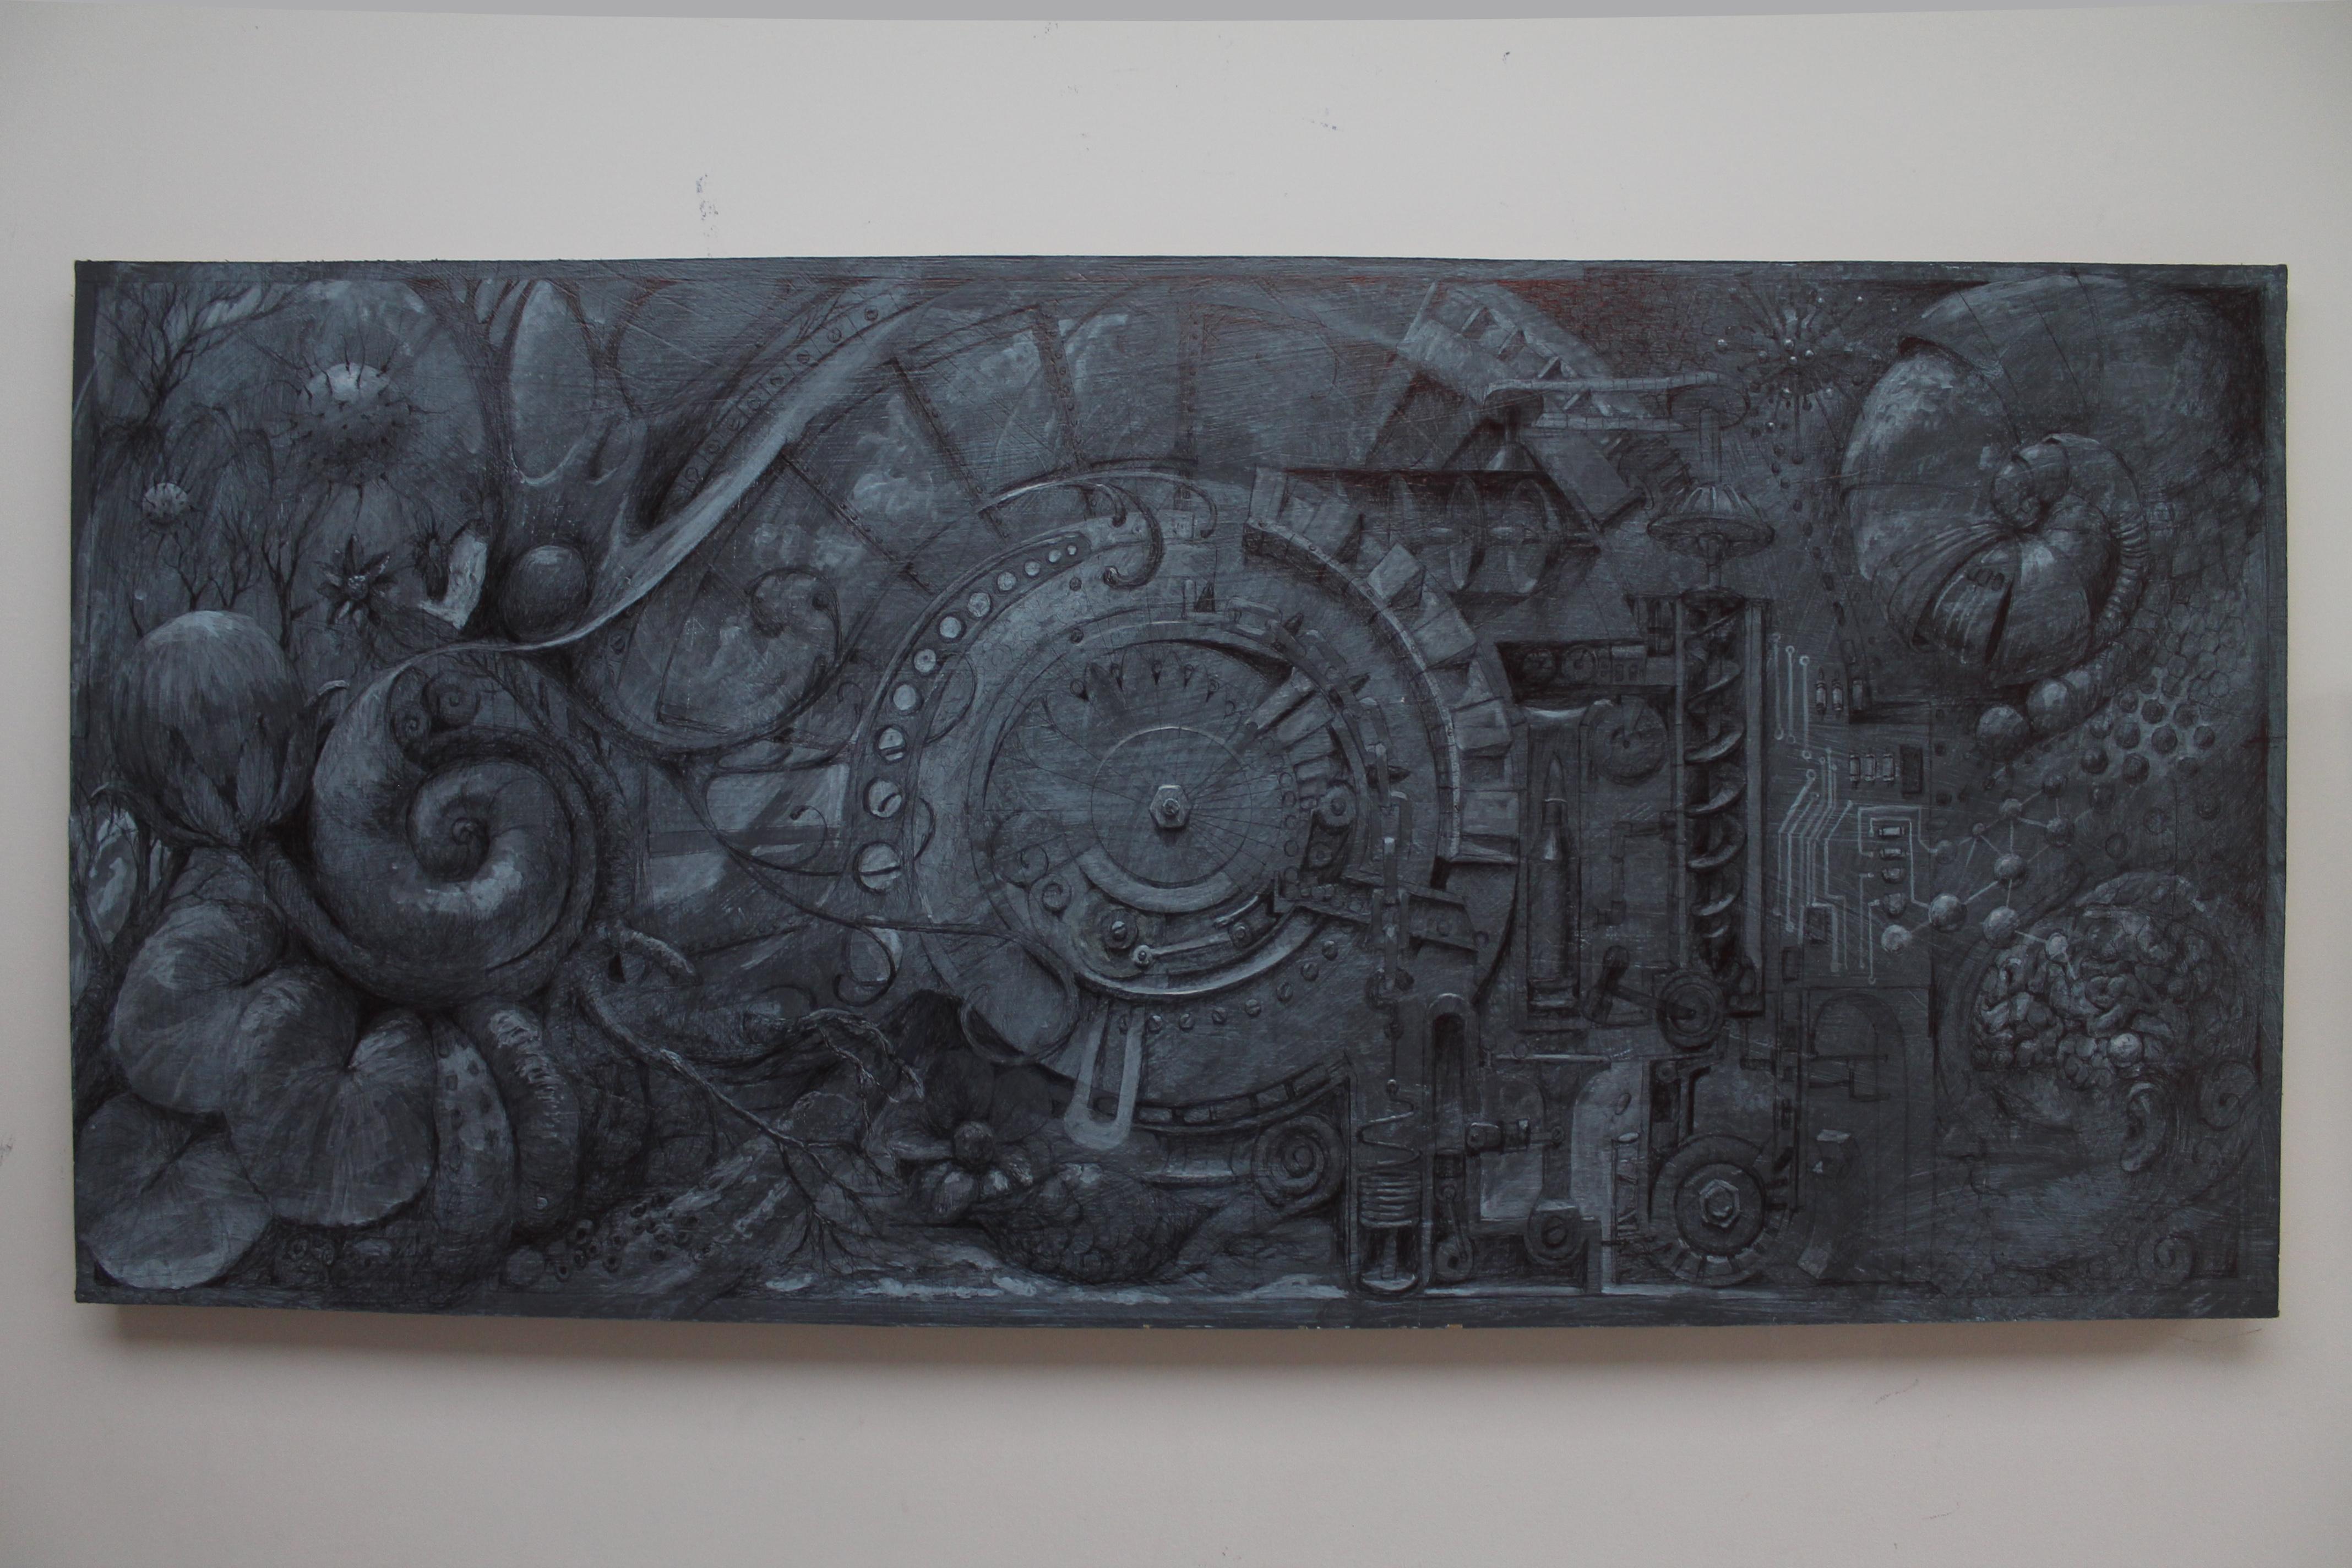 The Great Metamorphosis artwork